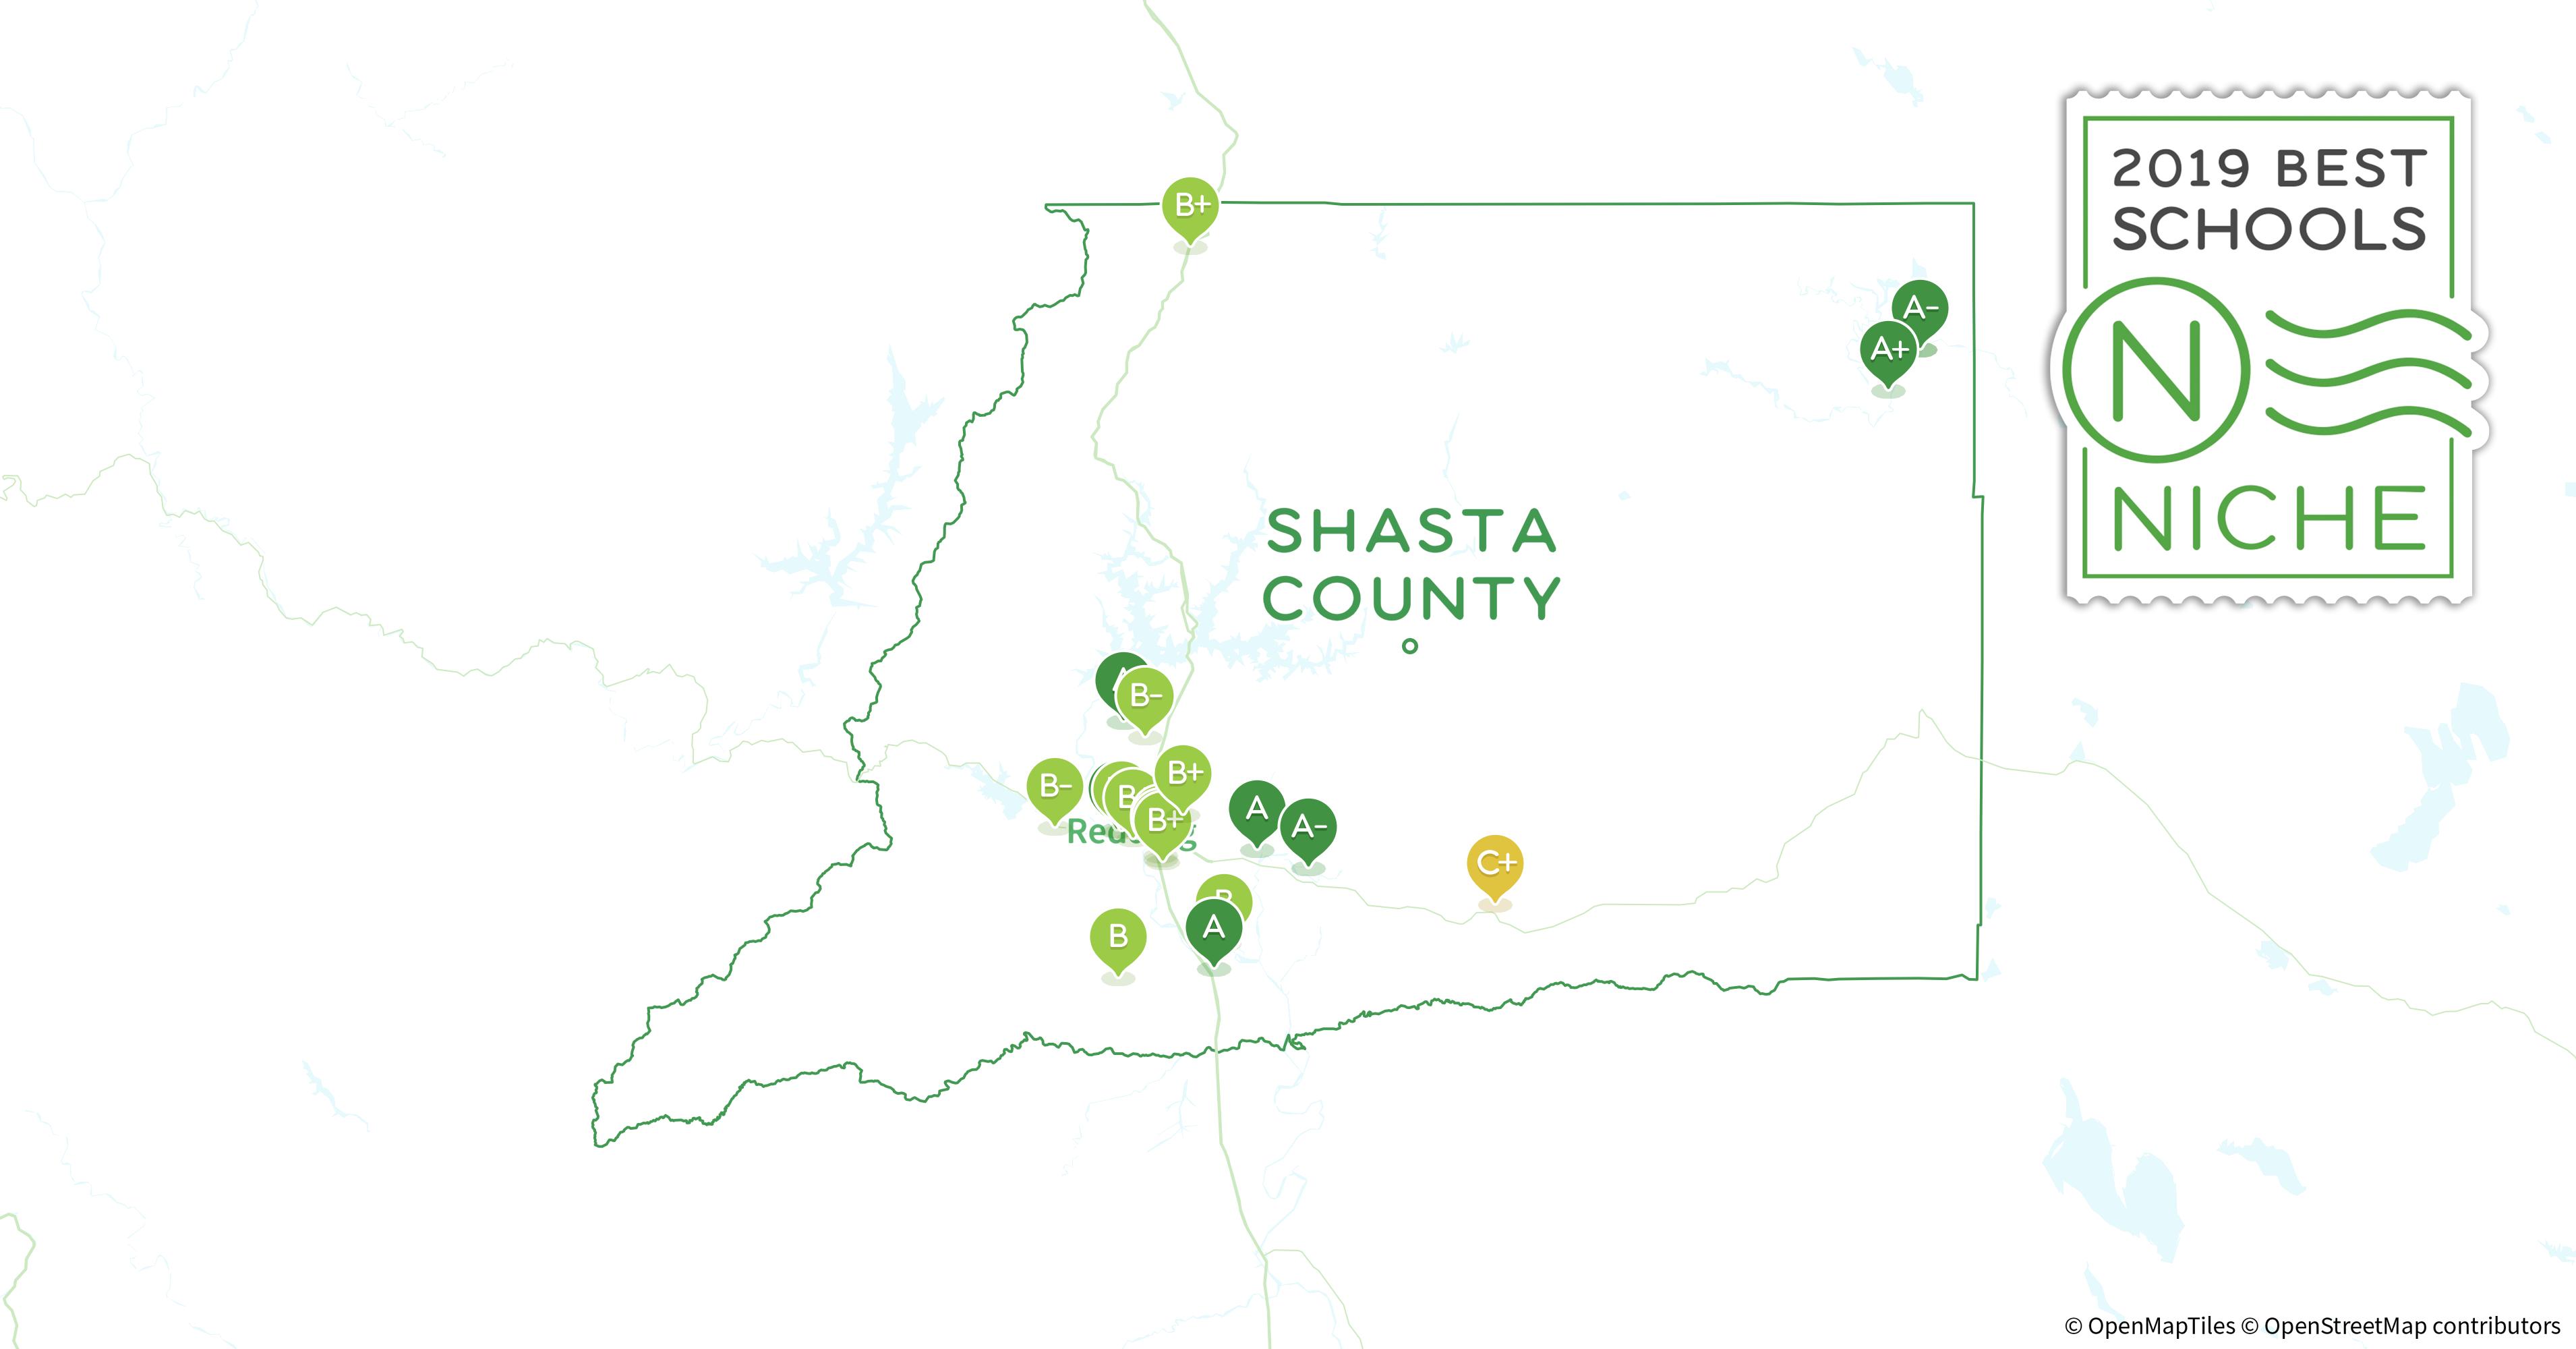 School Districts in Shasta County, CA - Niche